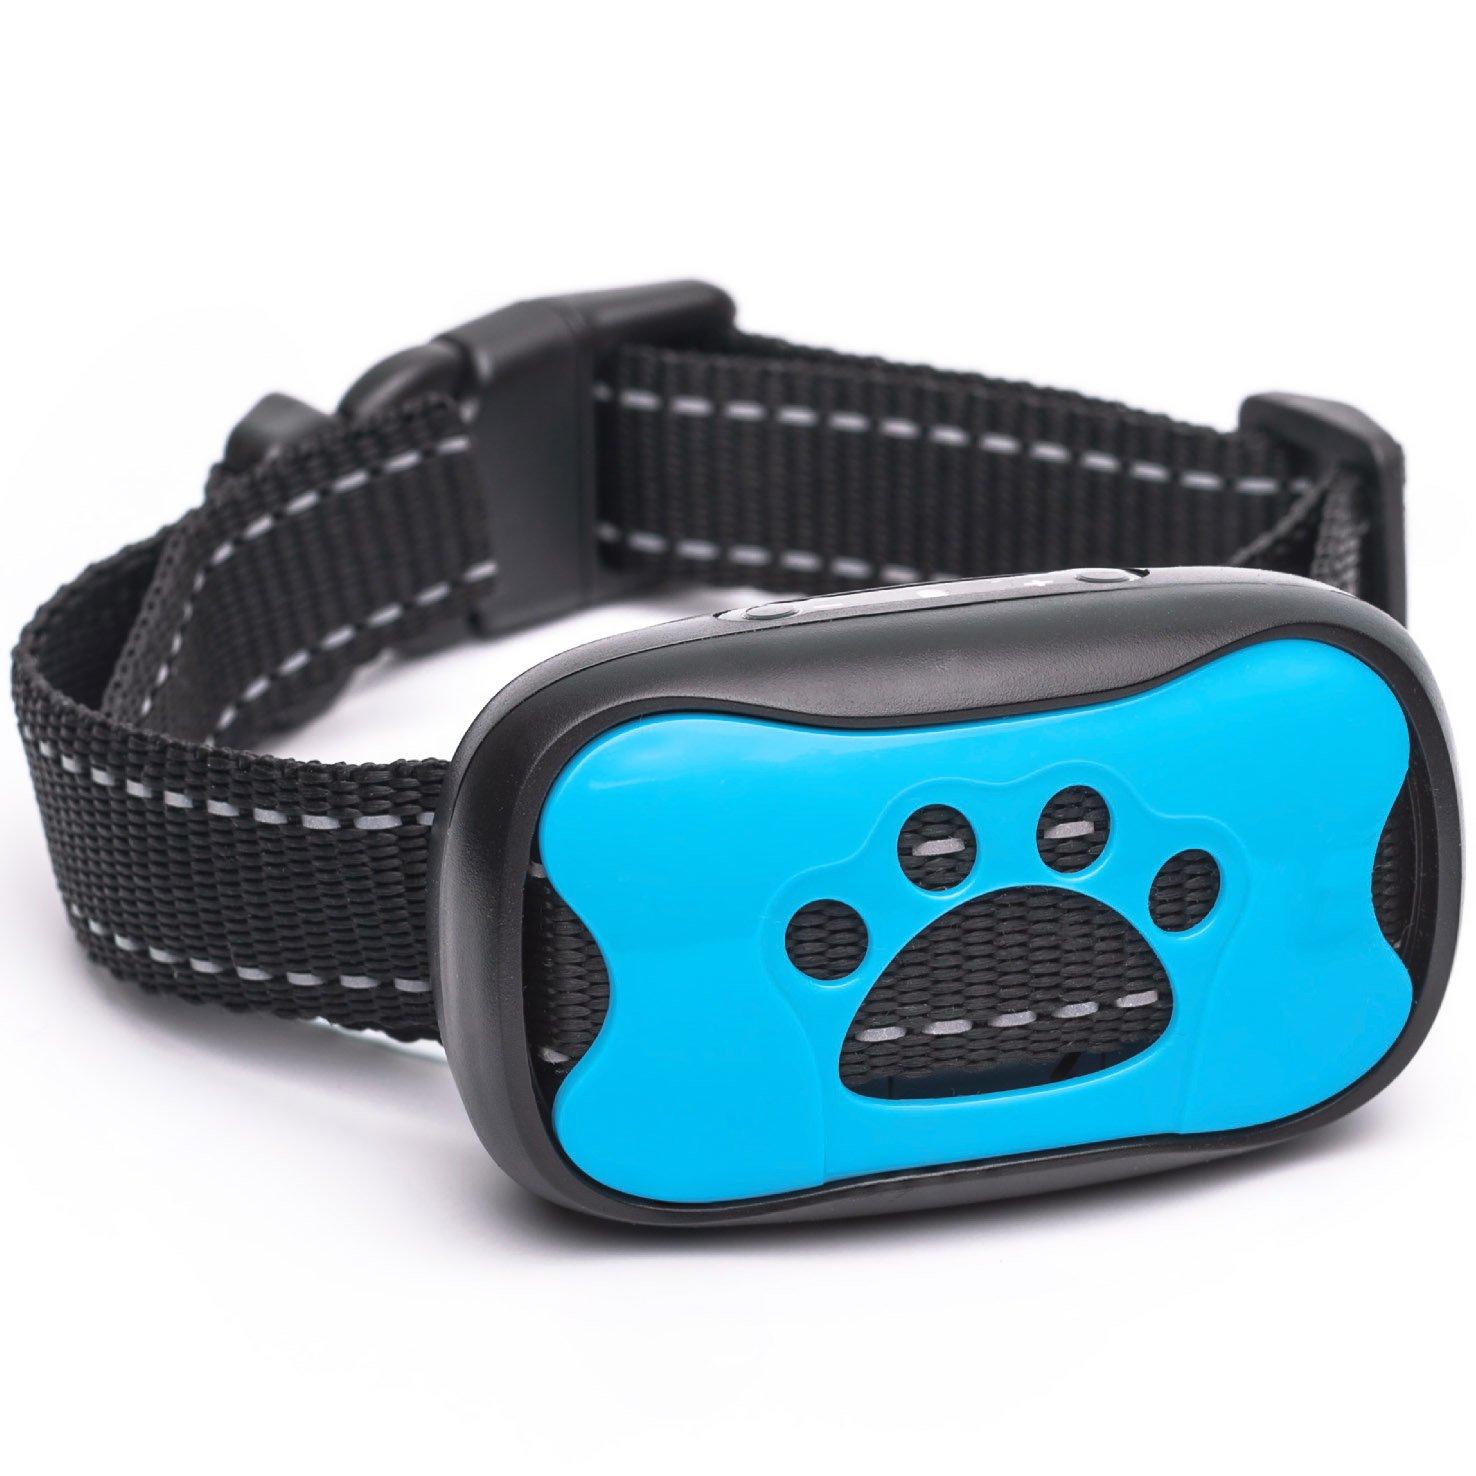 Dog Bark Collar 2018 Model - Humane Training Collar - Vibration No Shock Anti Bark Collar for Small Medium Large Dogs - 15 -100lbs - Safe Pet Device Bark Control